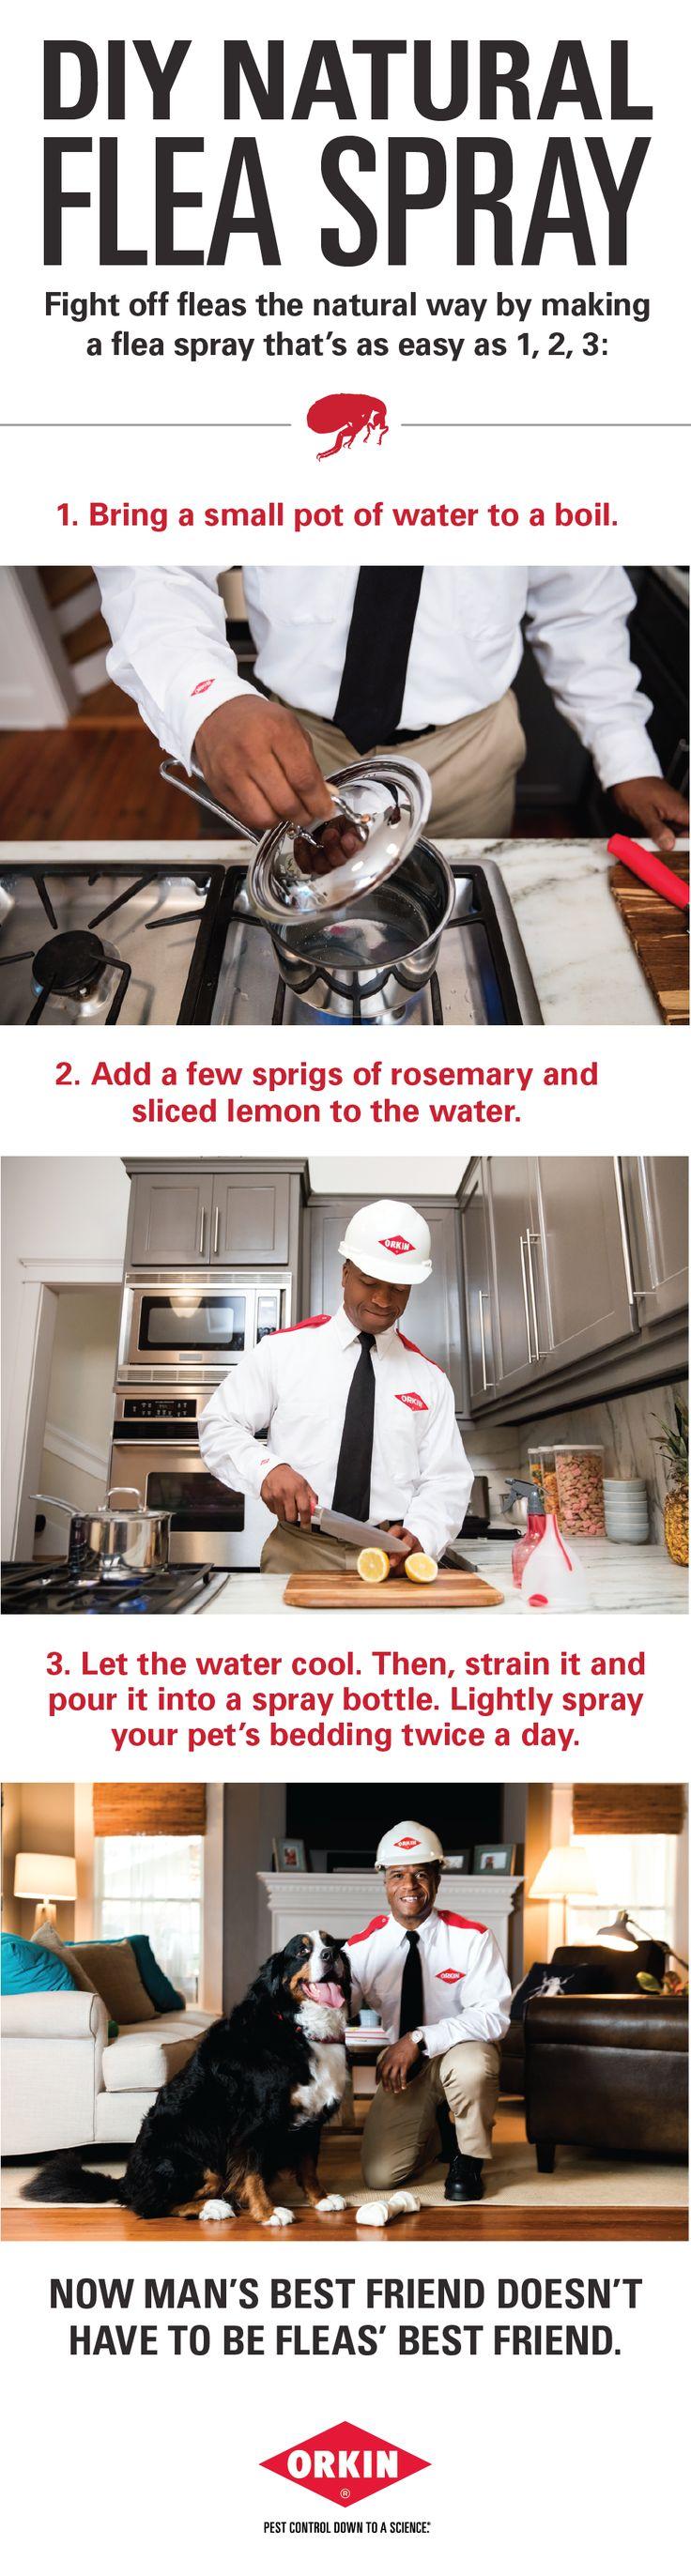 Make Your Own #DIY Flea Spray